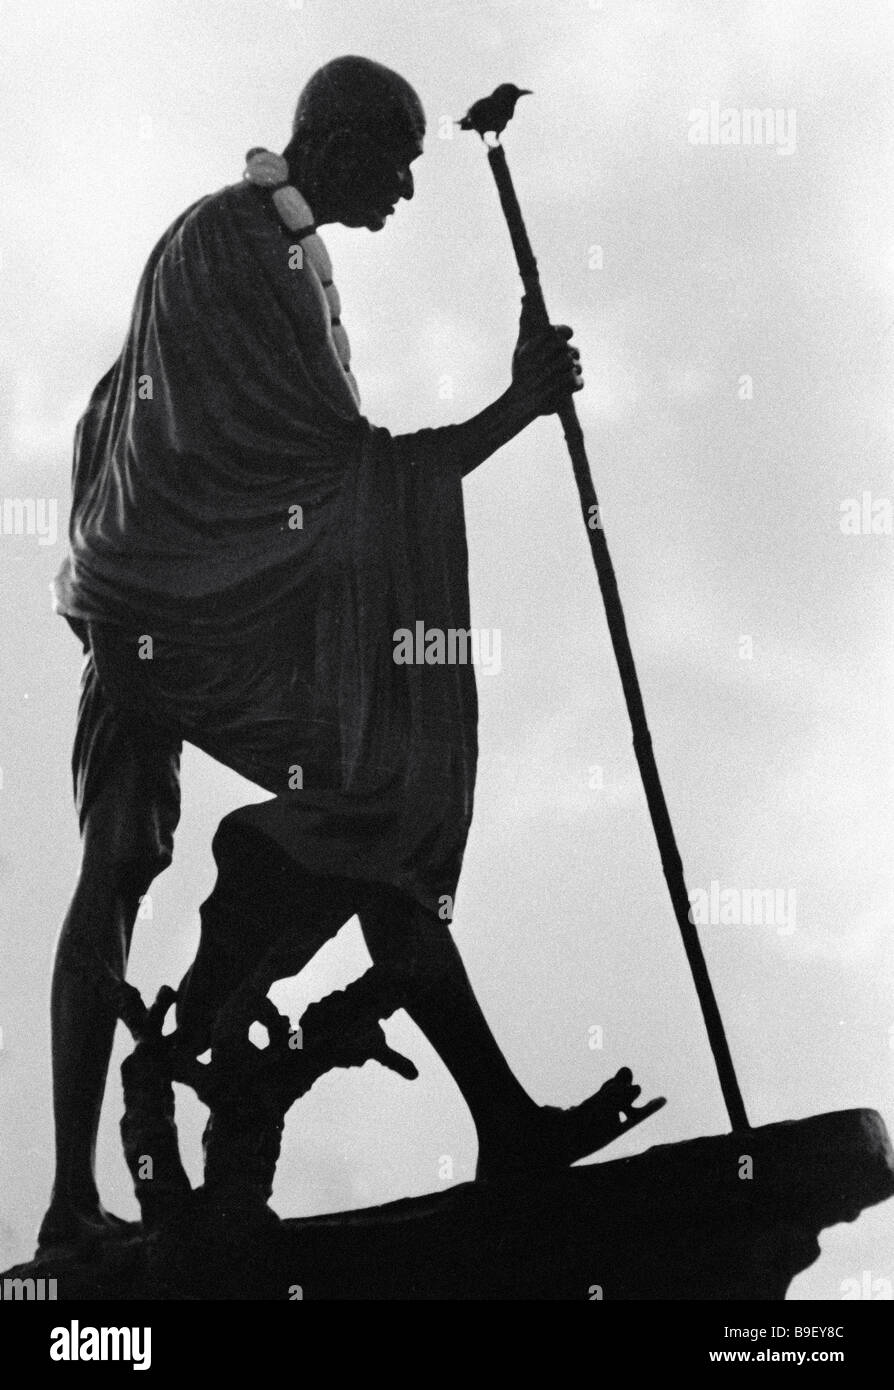 Monument to Mahatma Gandhi in India - Stock Image